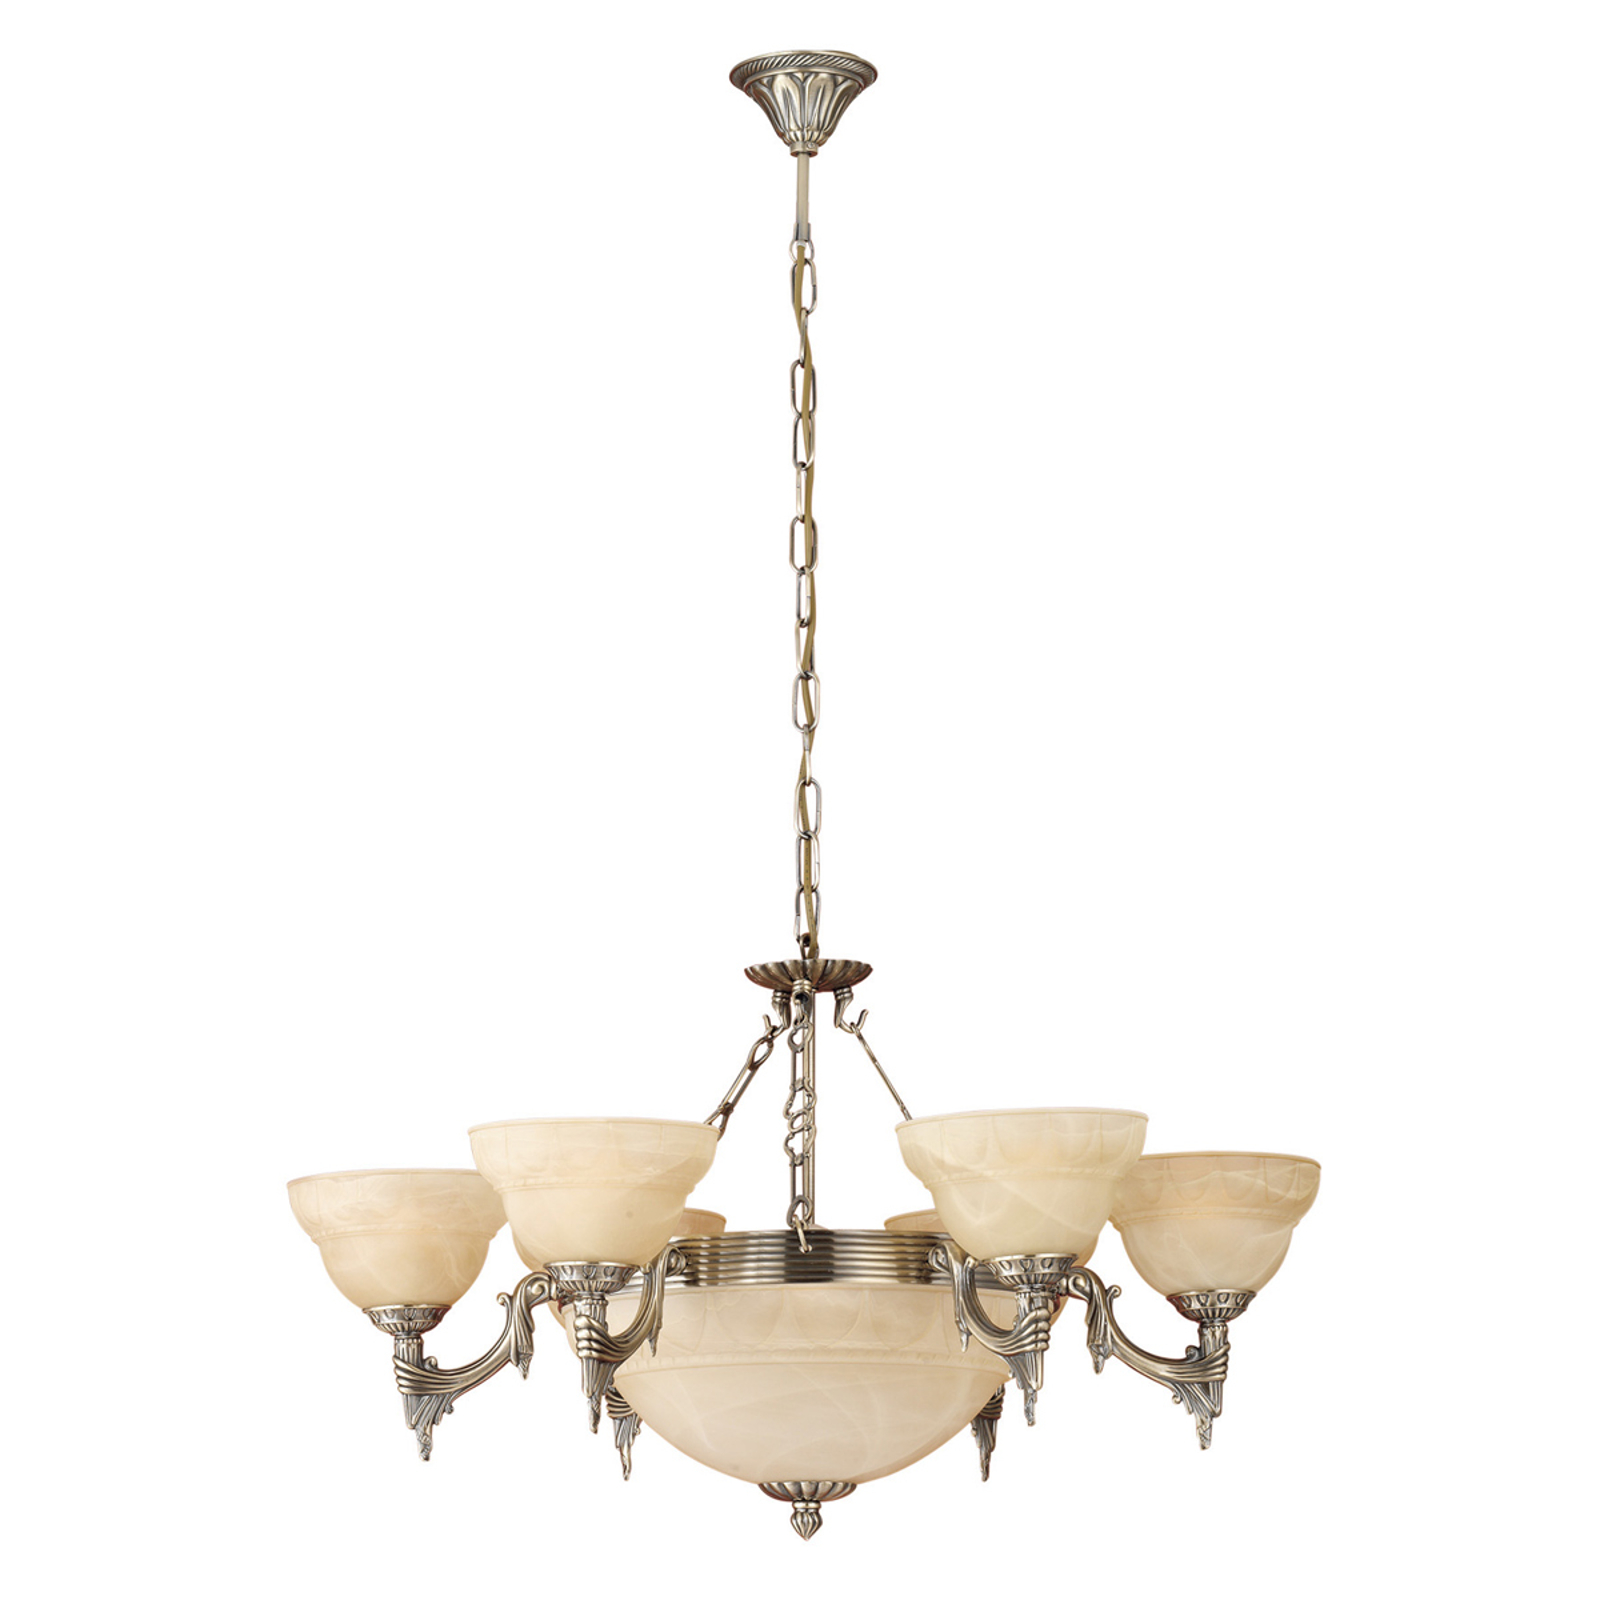 Stijlvolle hanglamp Marilla 9 lichts